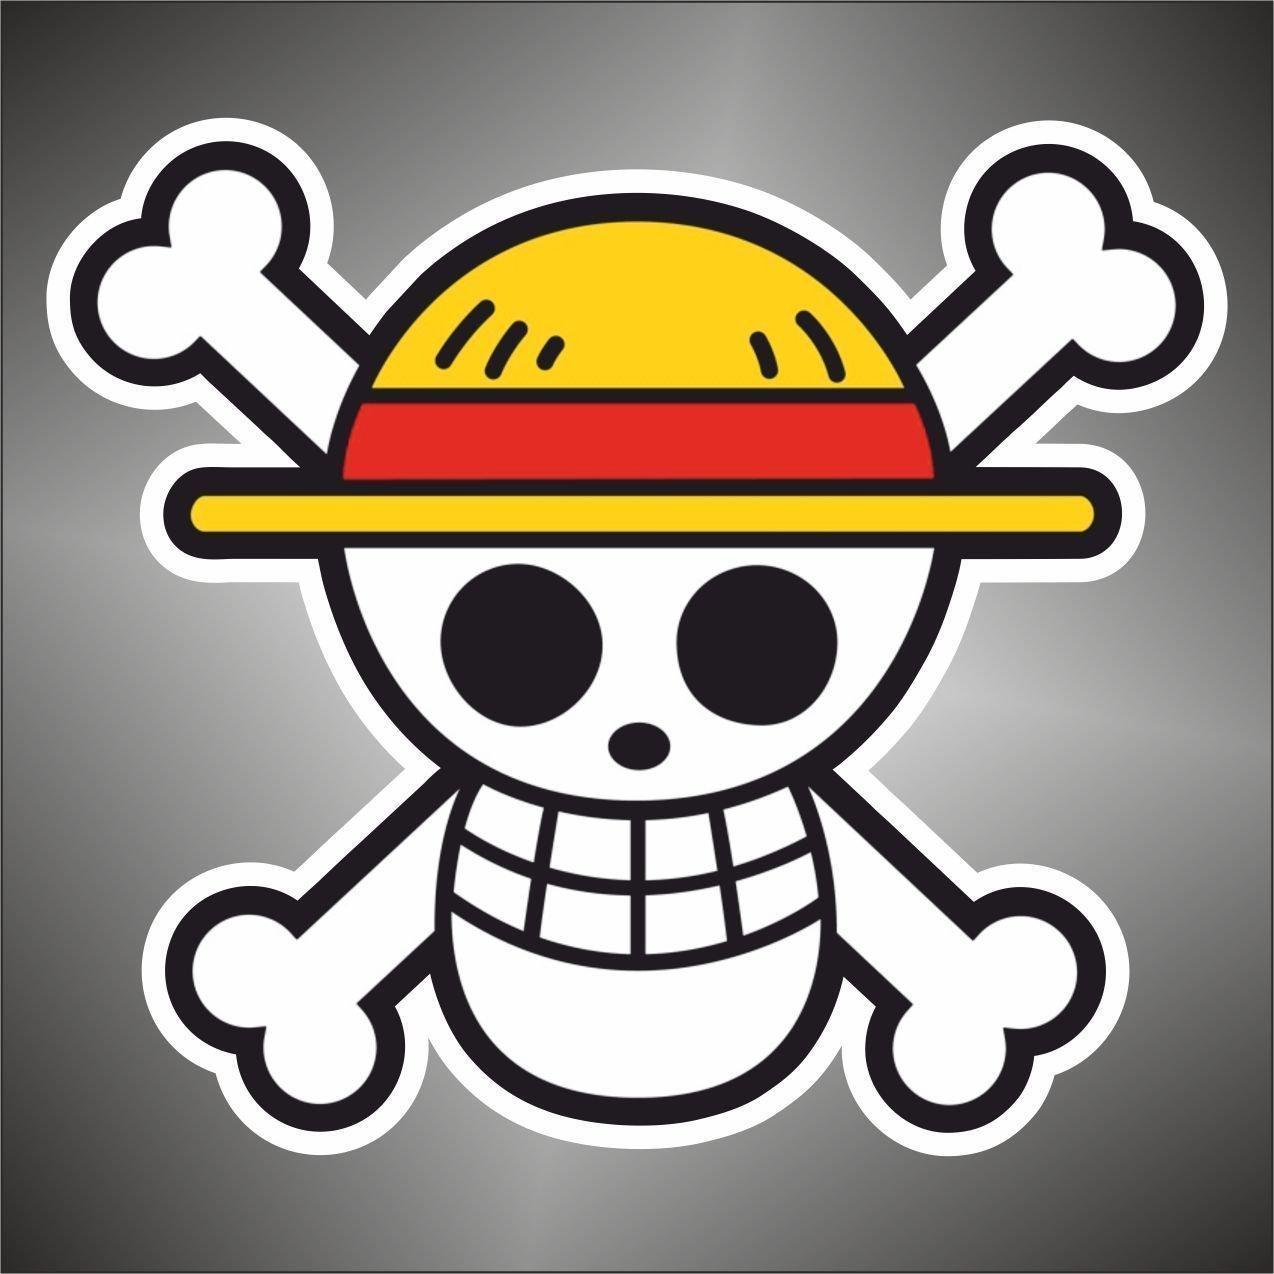 Autocollant One Piece Monkey Manga anime bande dessiné e Dessins animé s Cartoon Sticker Graphic-lab